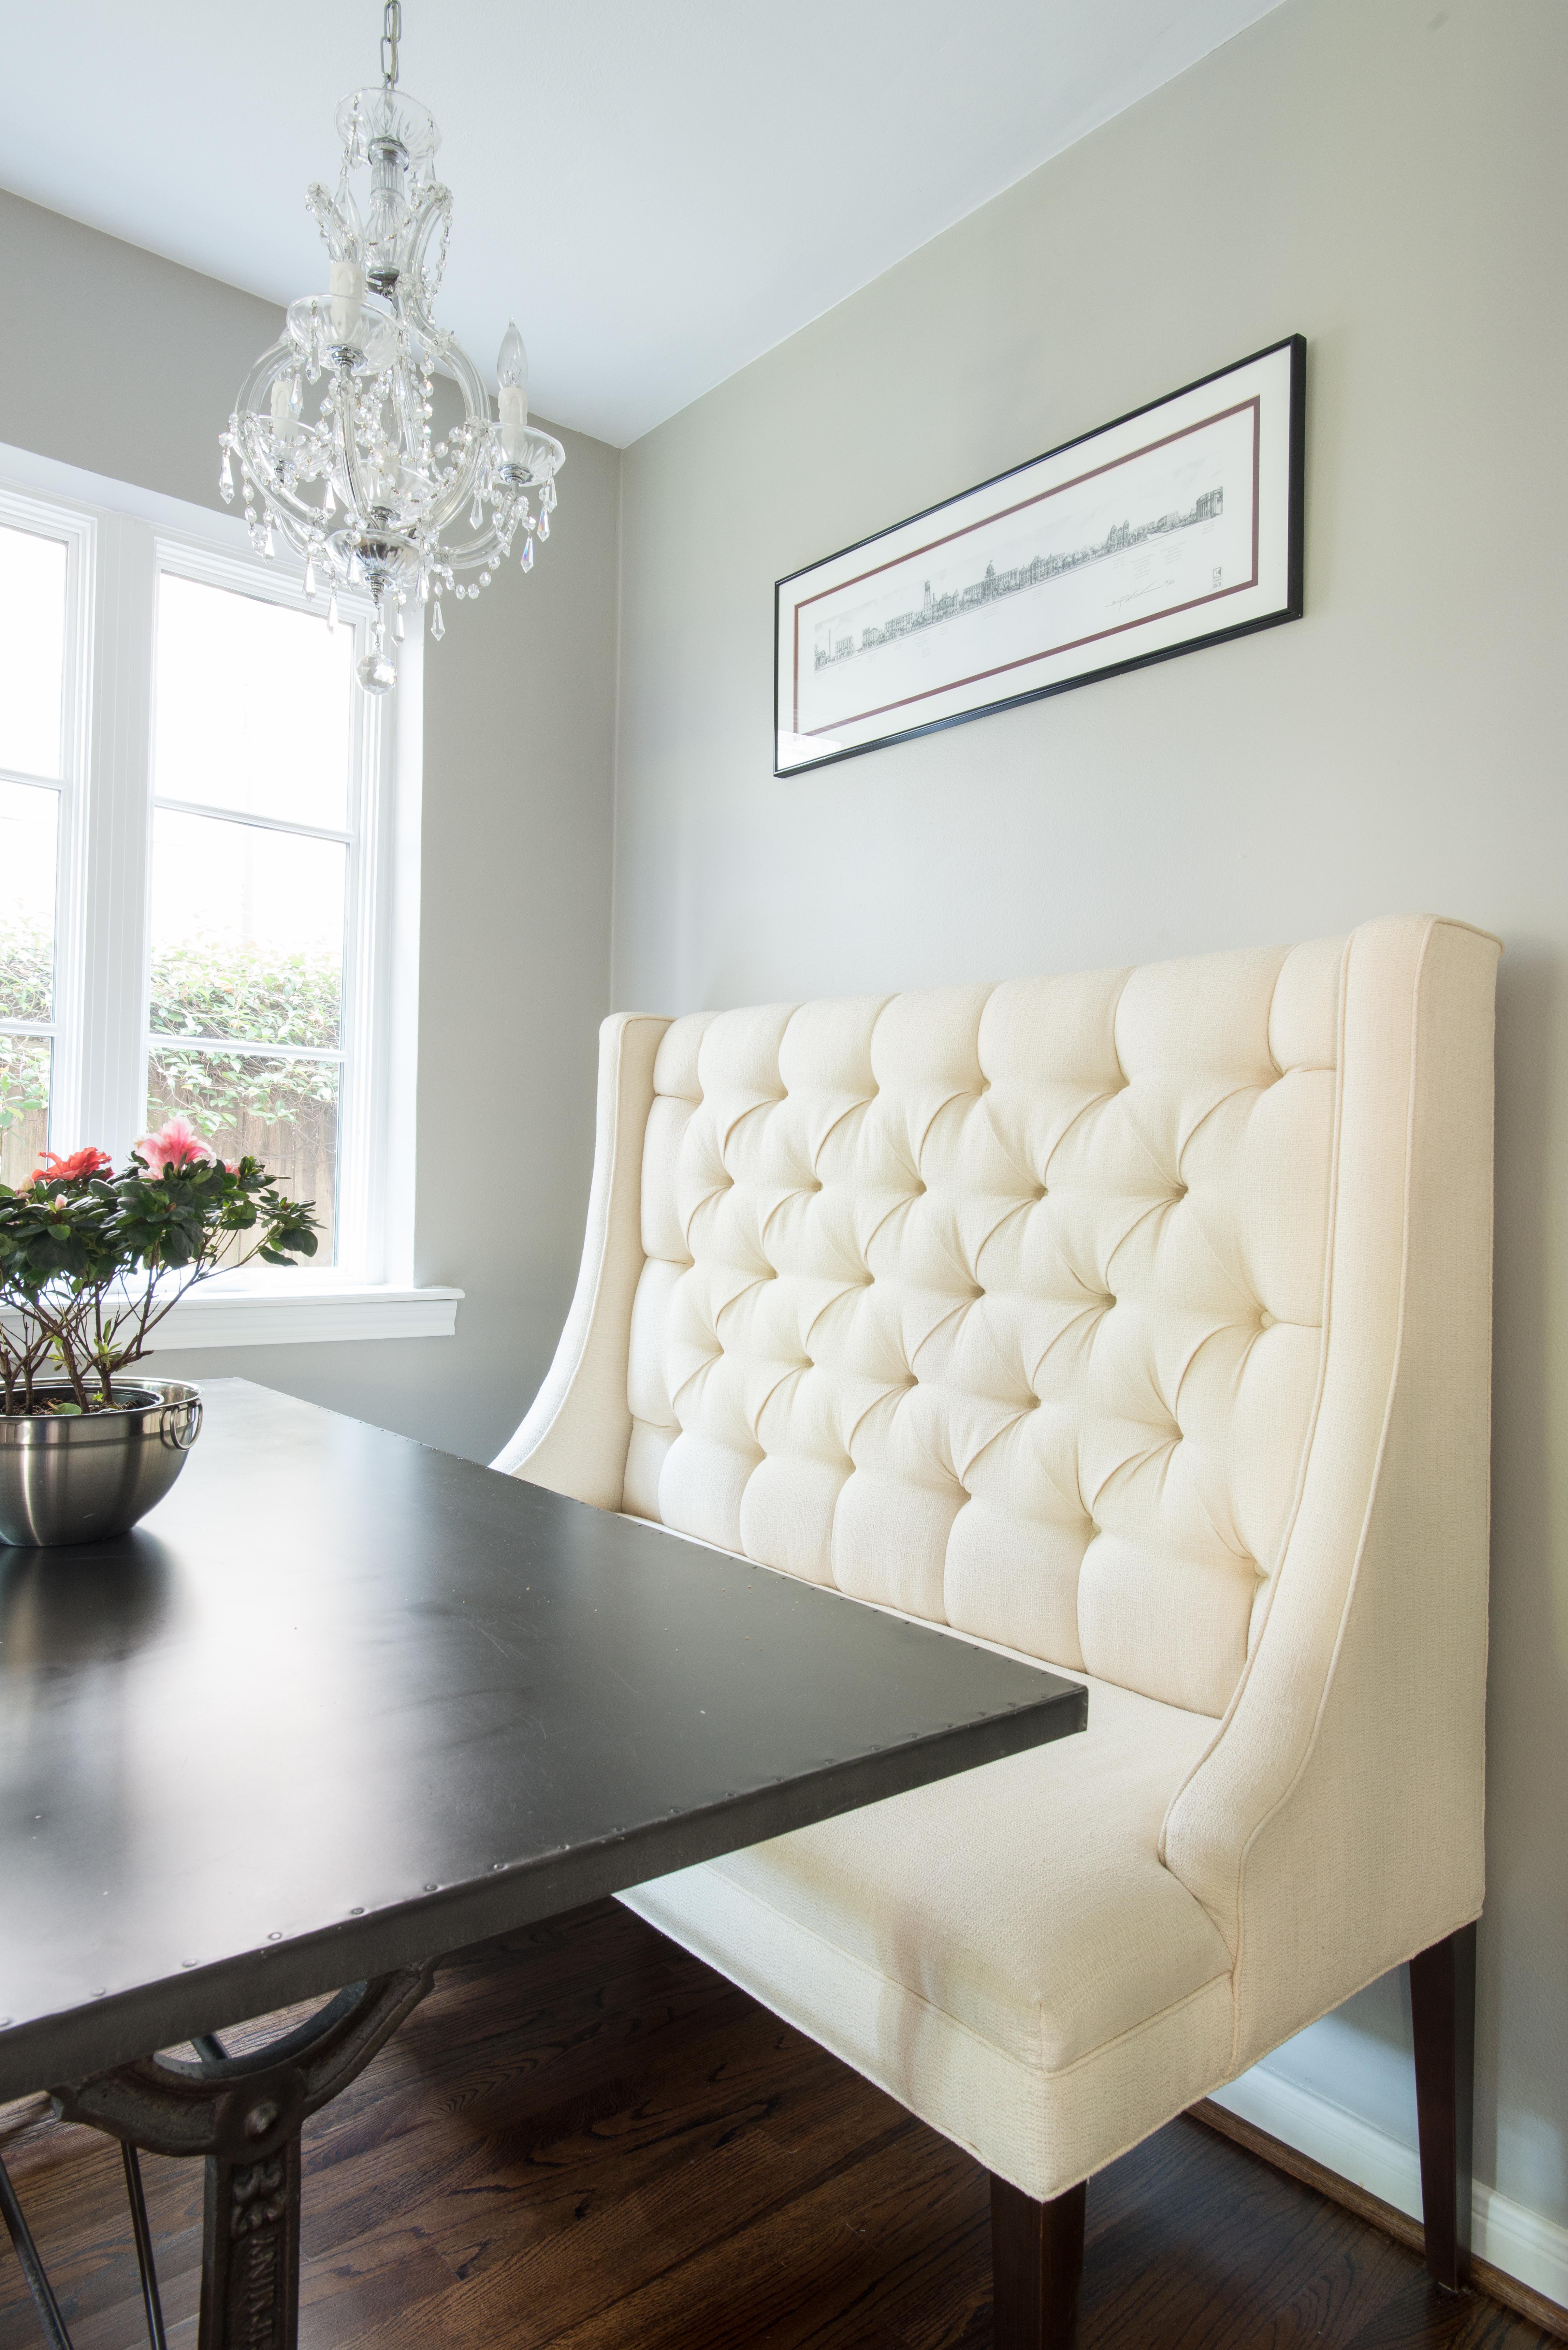 Jl Interior Design. jl home design home design ideas. koo foundation ...